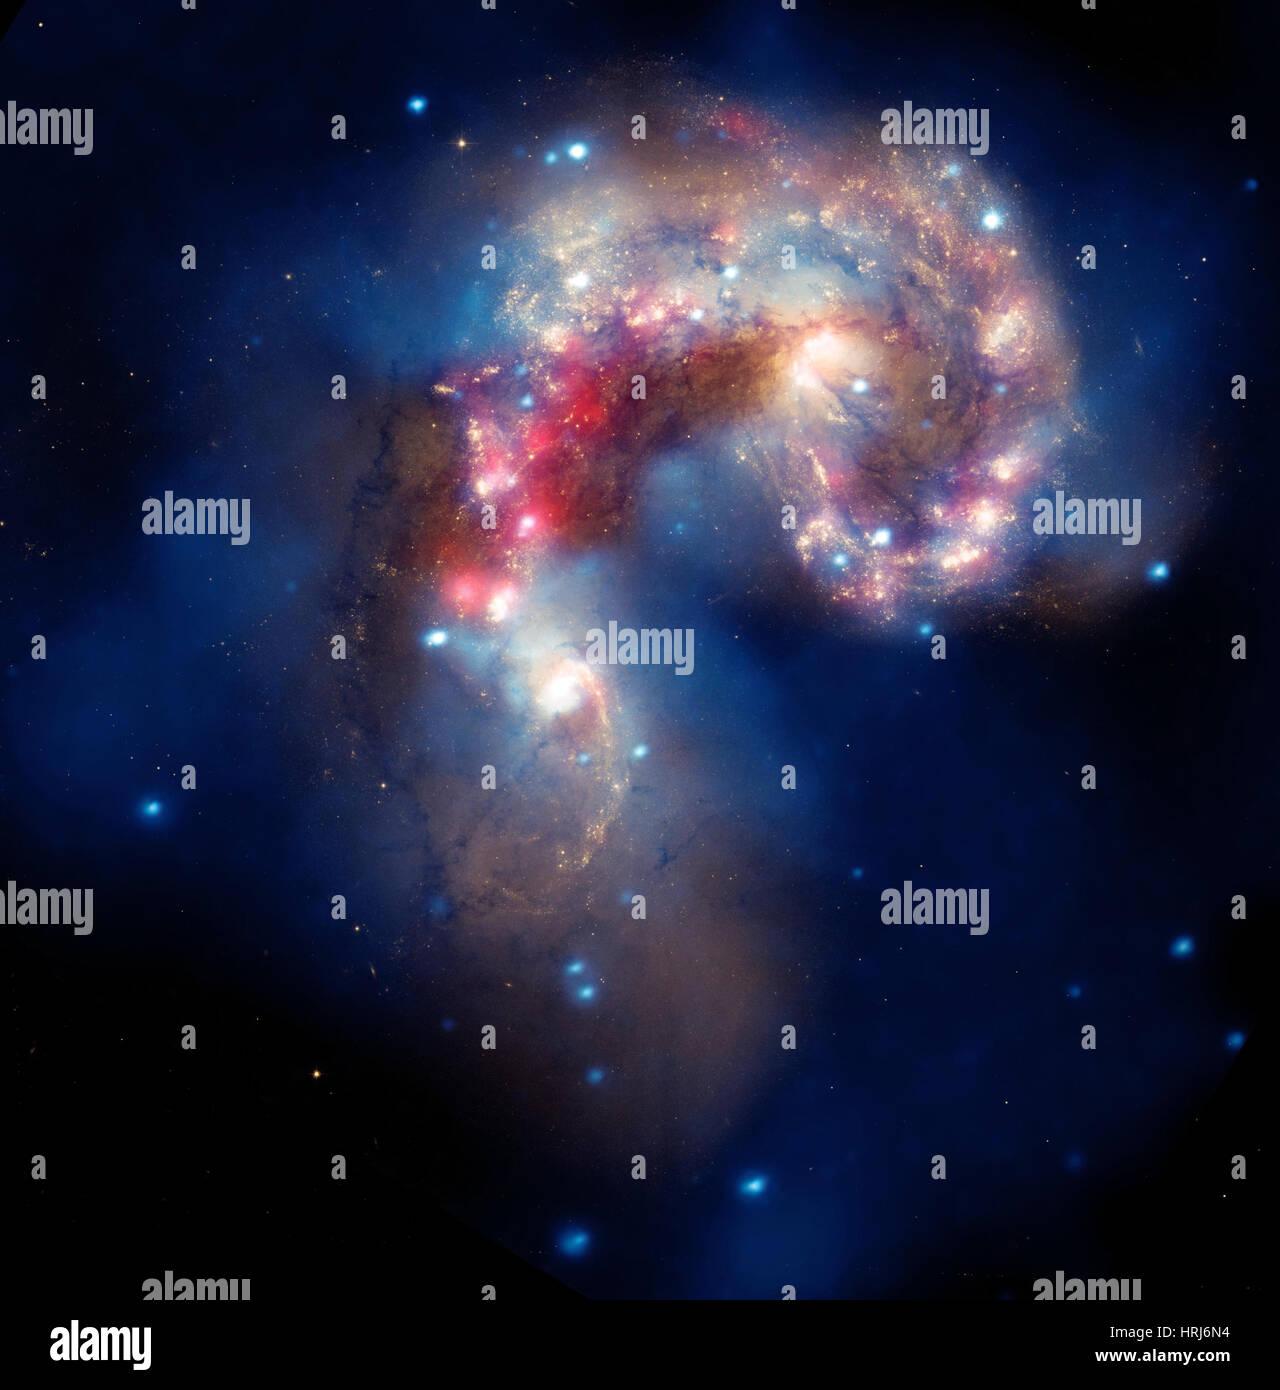 NGC 4038/NGC 4039, Caldwell 60/61, Antennae Galaxies - Stock Image